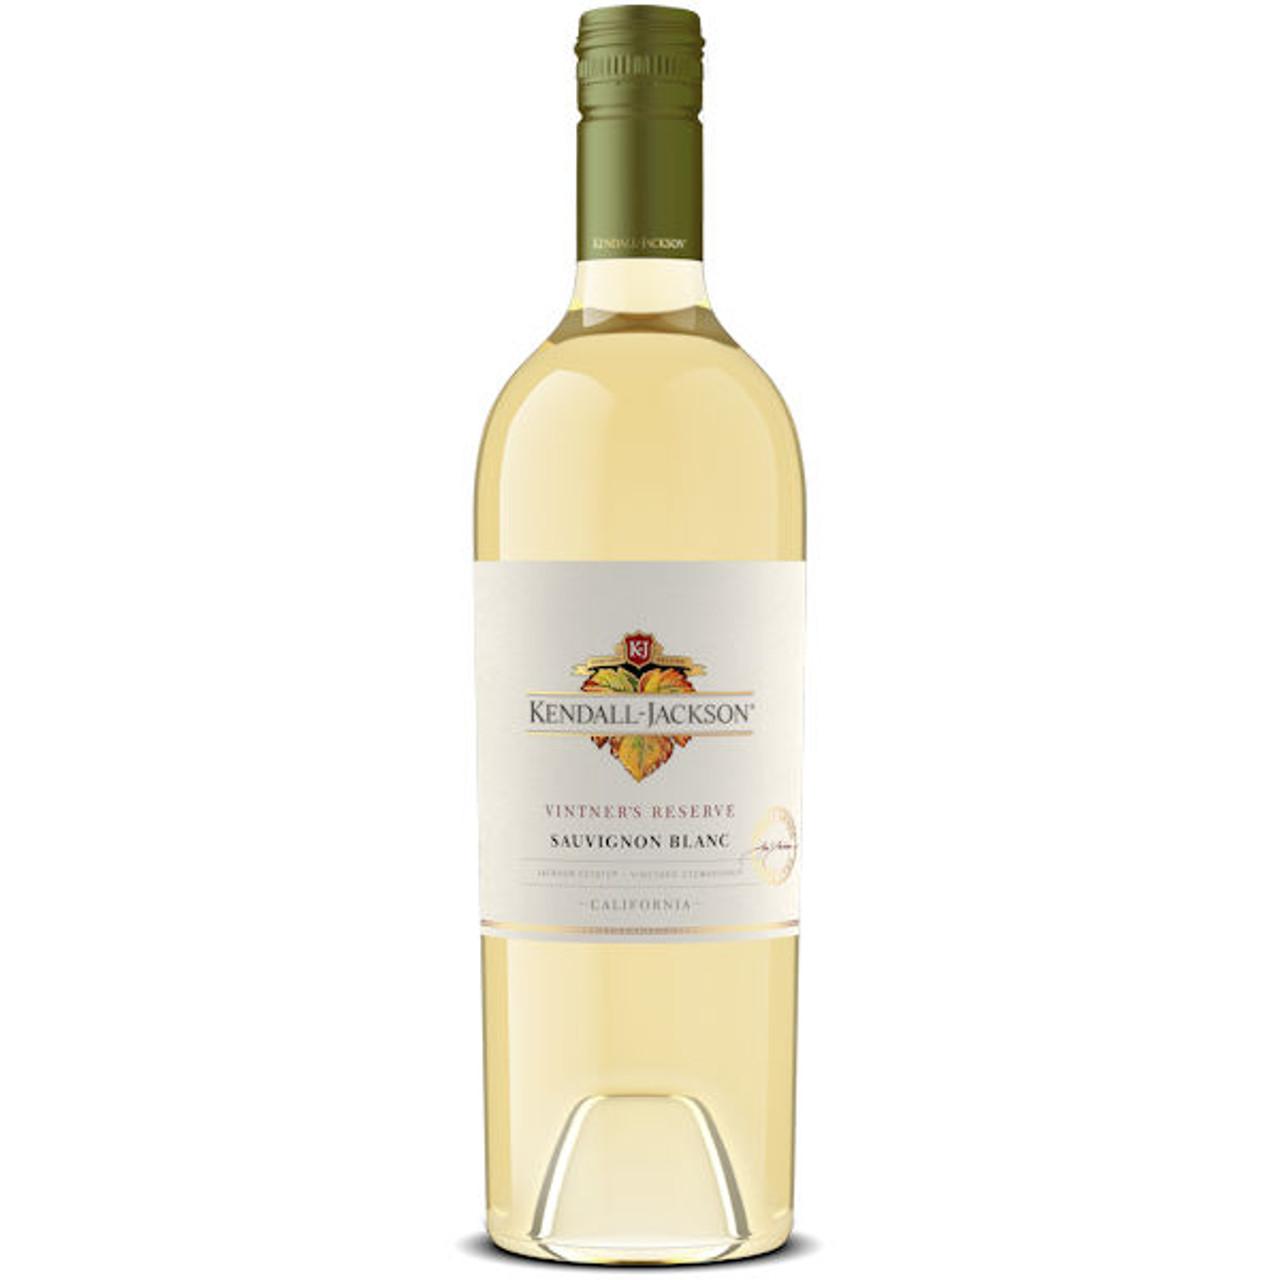 Kendall Jackson Vintner's Reserve California Sauvignon Blanc